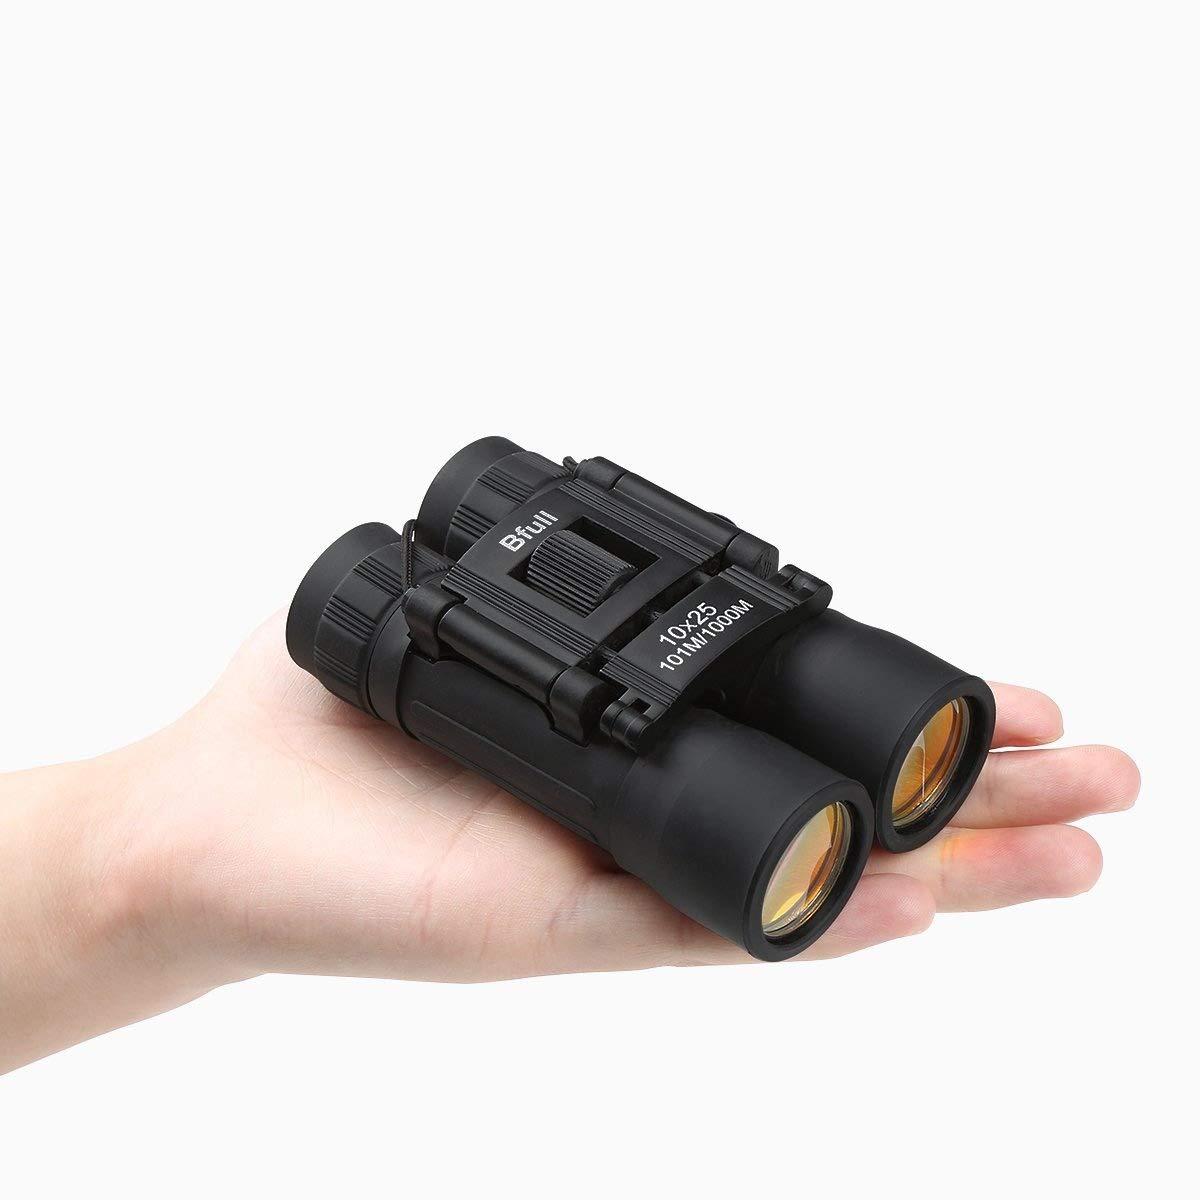 bfull Mini prismáticos compacto plegable prismáticos telescopio para observación de aves viaje